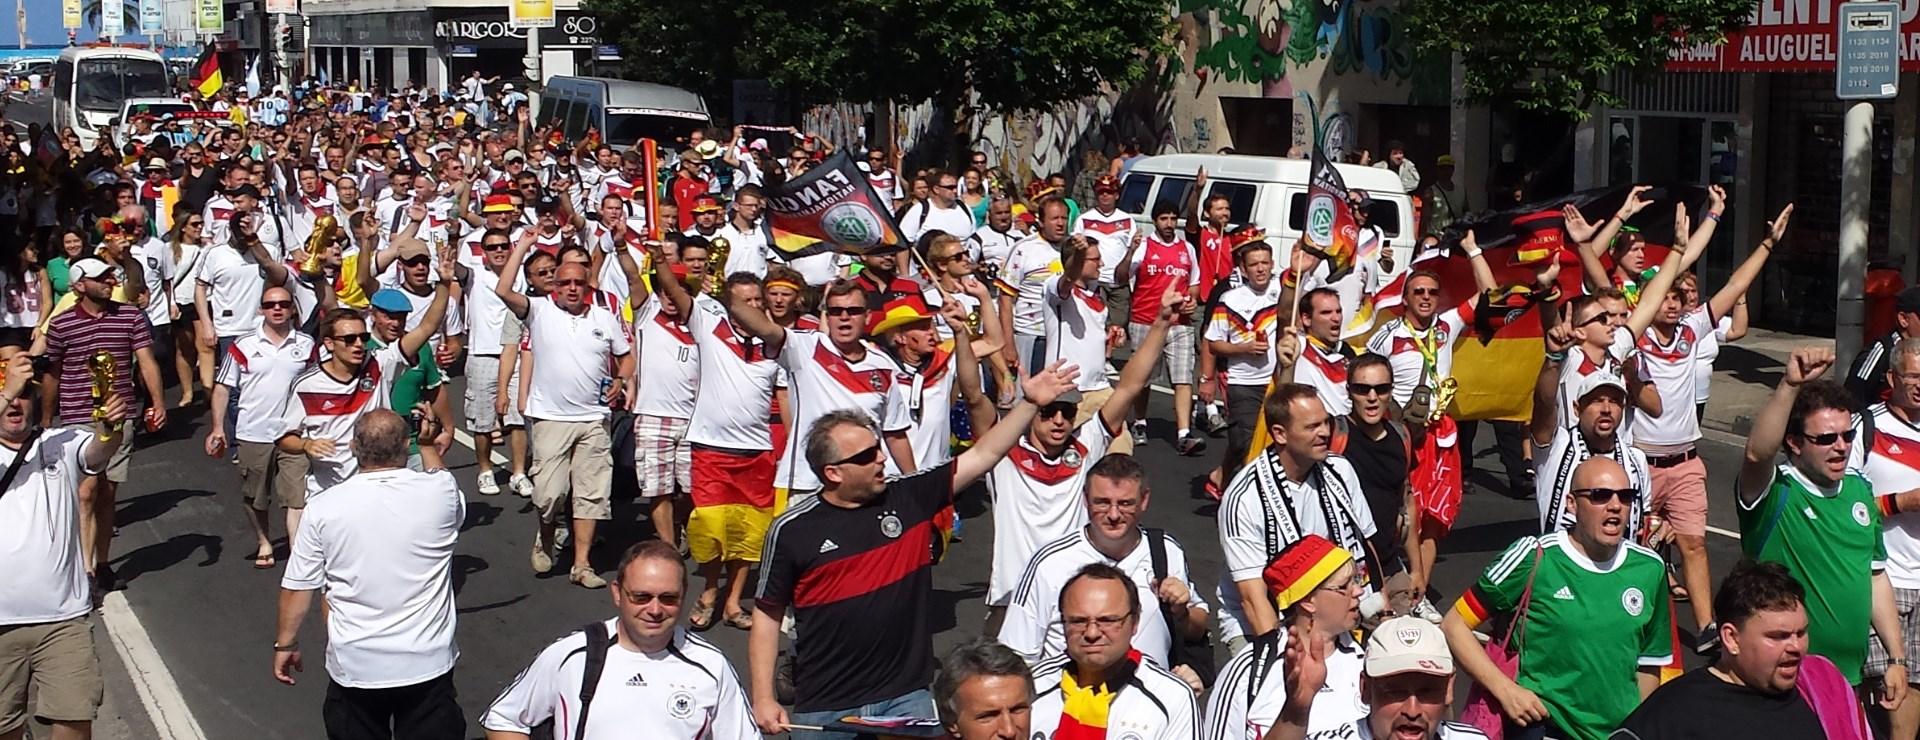 Fan-Club-Nationalmannschaft_WM-Finale_Copacabana_W-com-Sportmarketing_Sportsponsoring_Rio